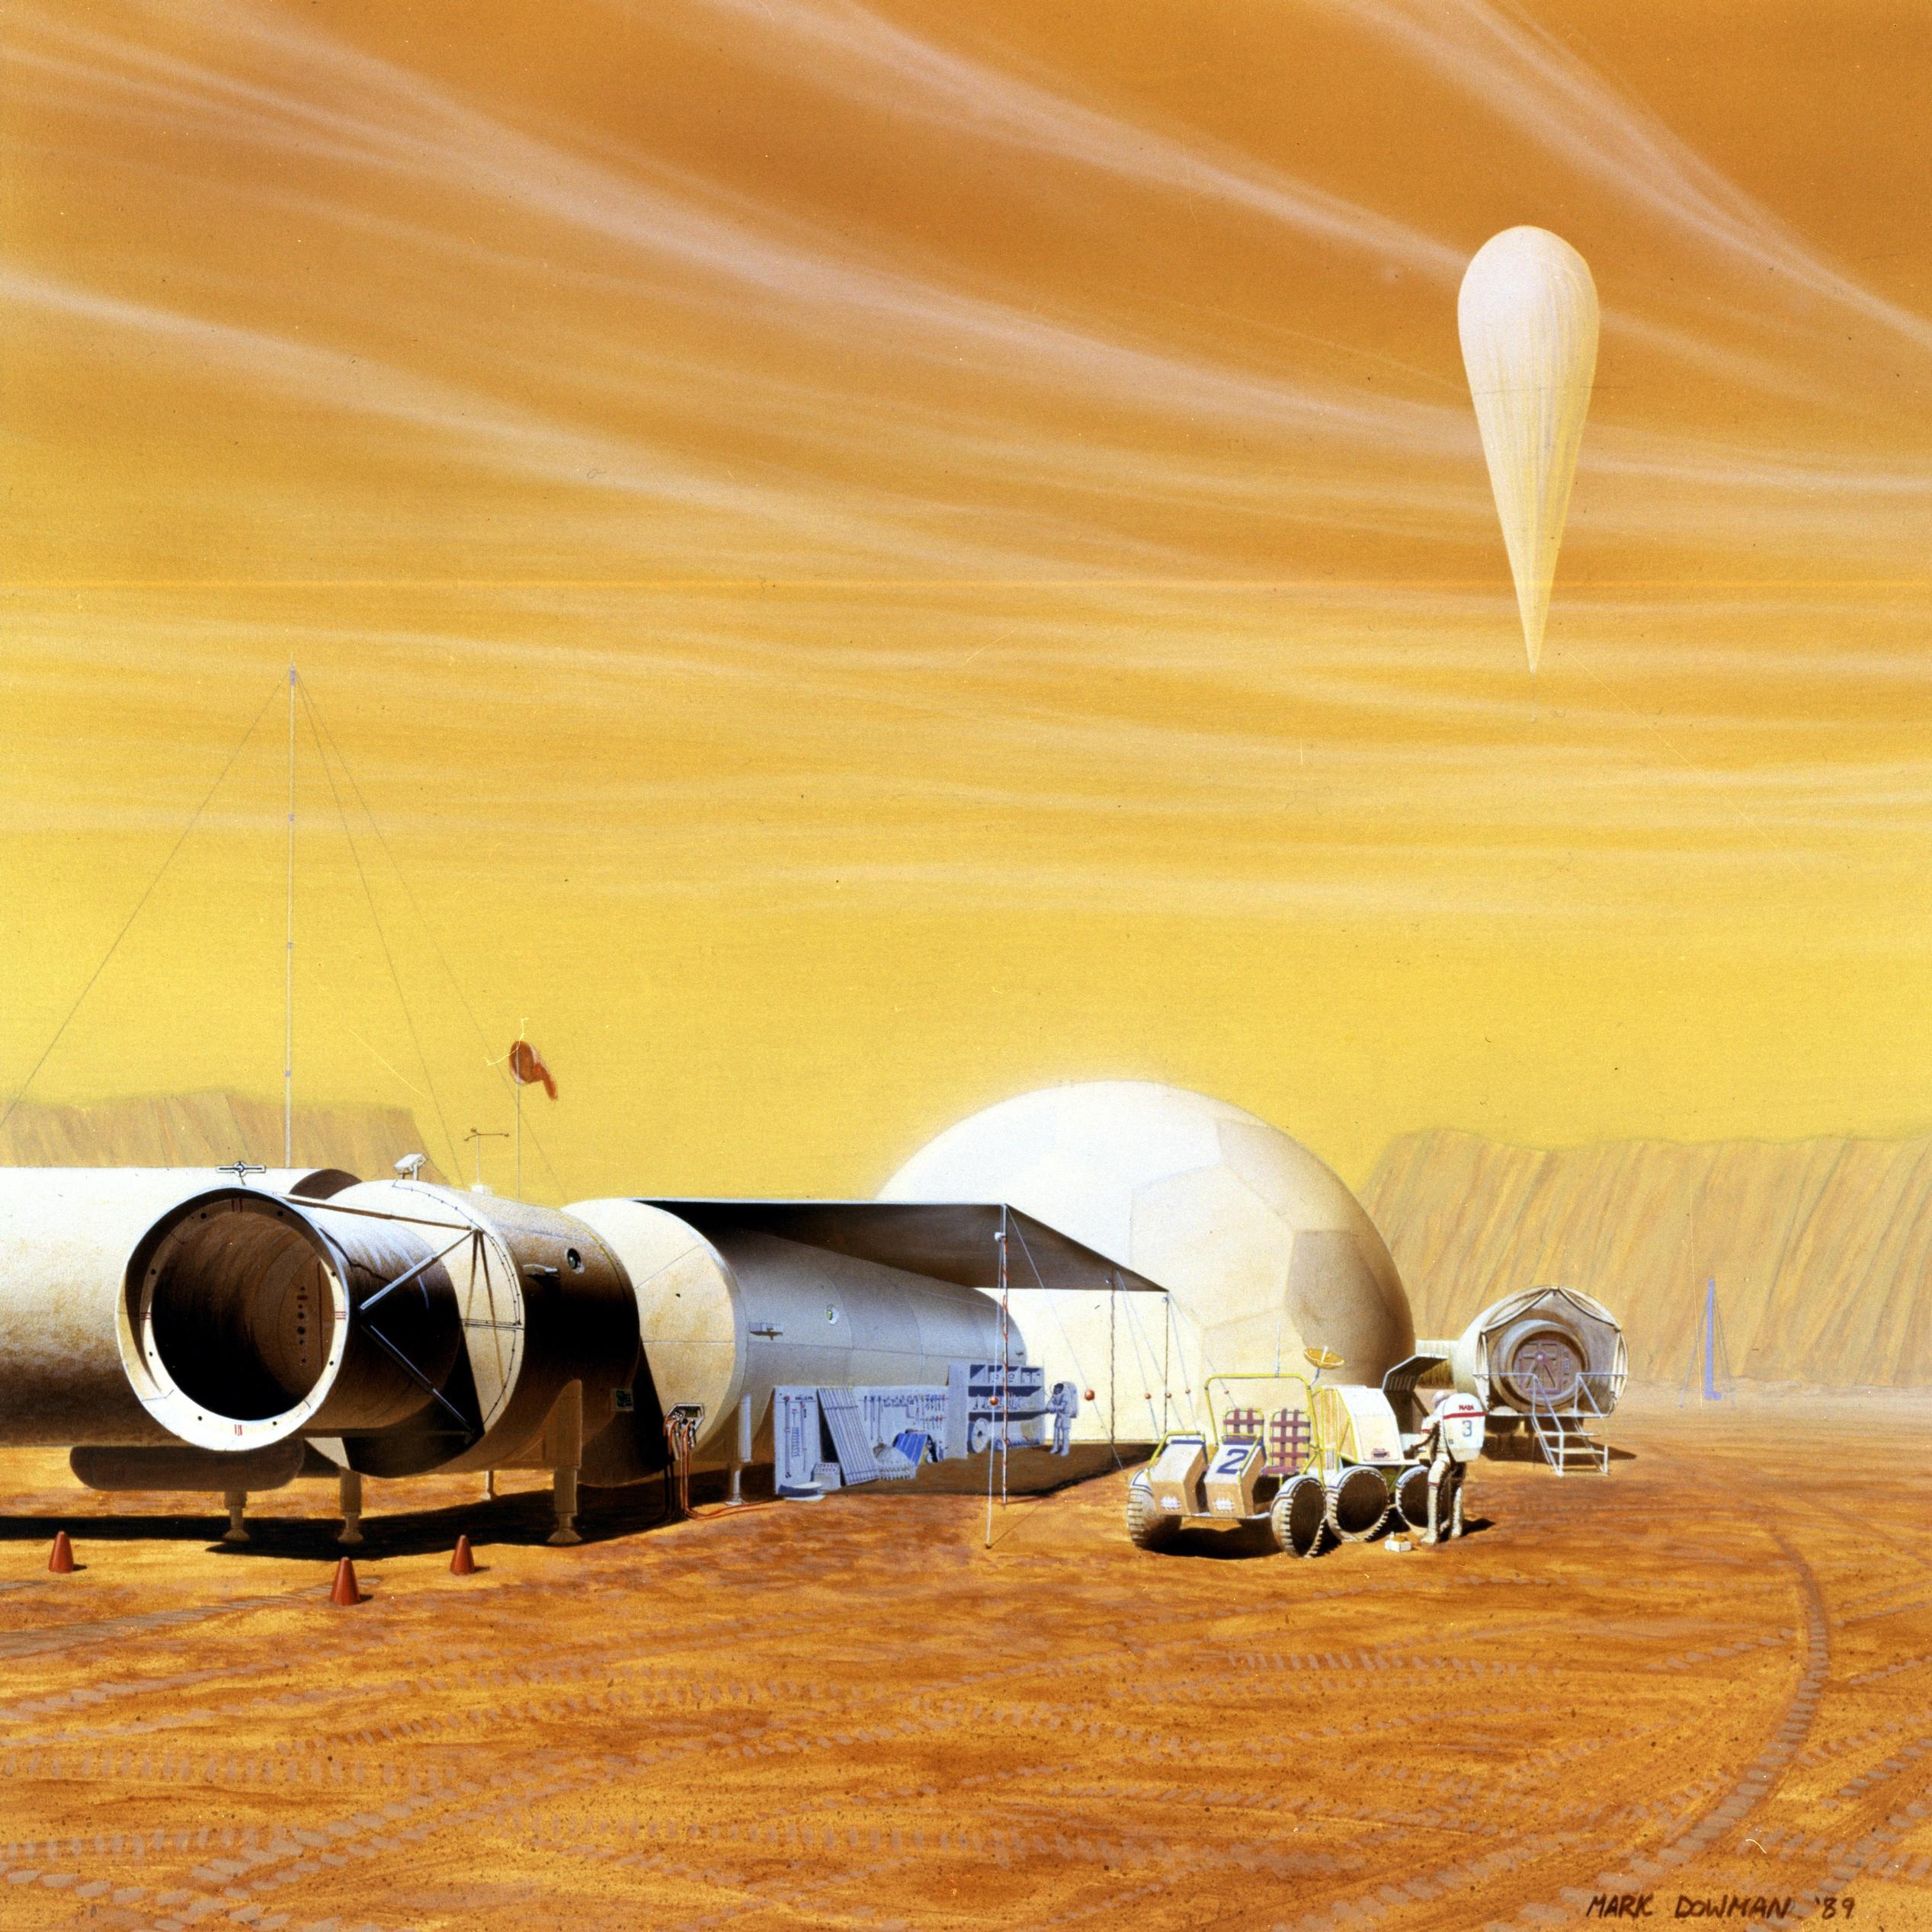 Martian Outpost – NASA\'s Mars Exploration Program